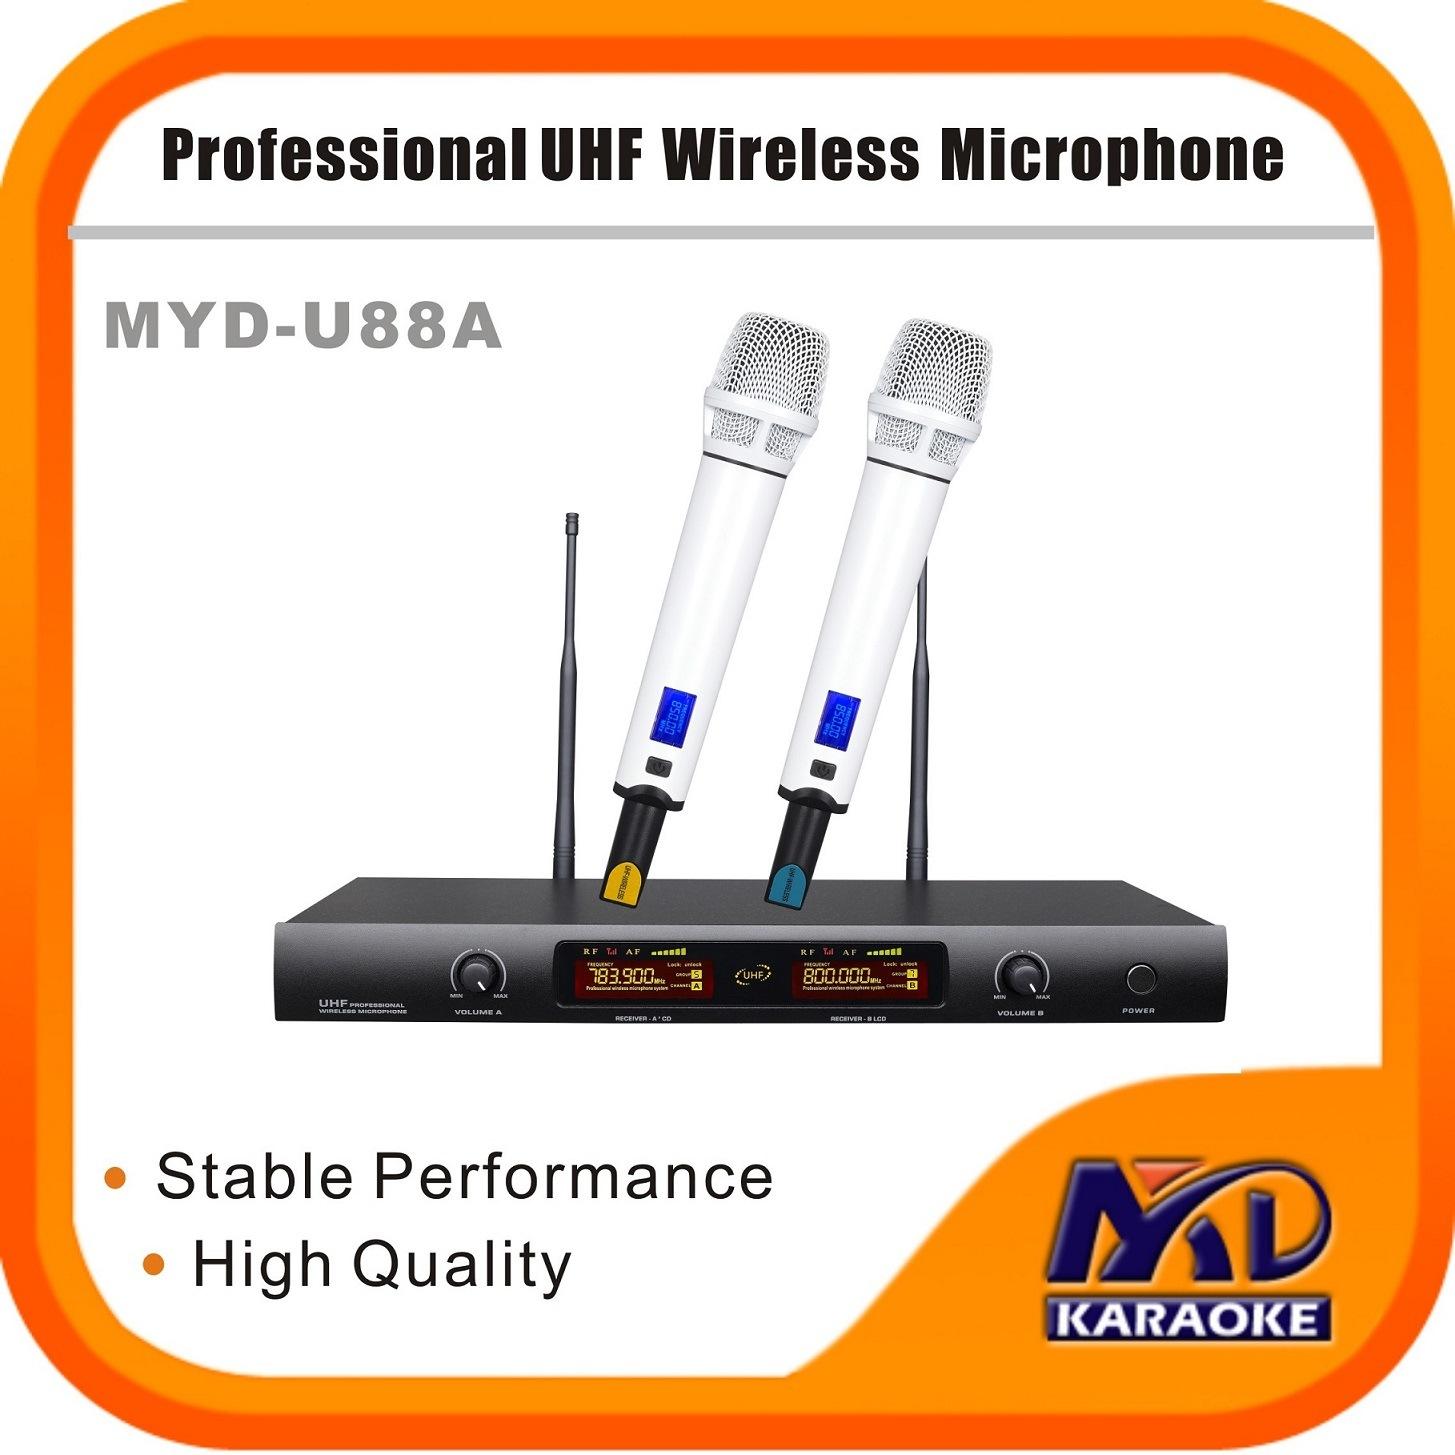 UHF Wireless Microphone LED Display